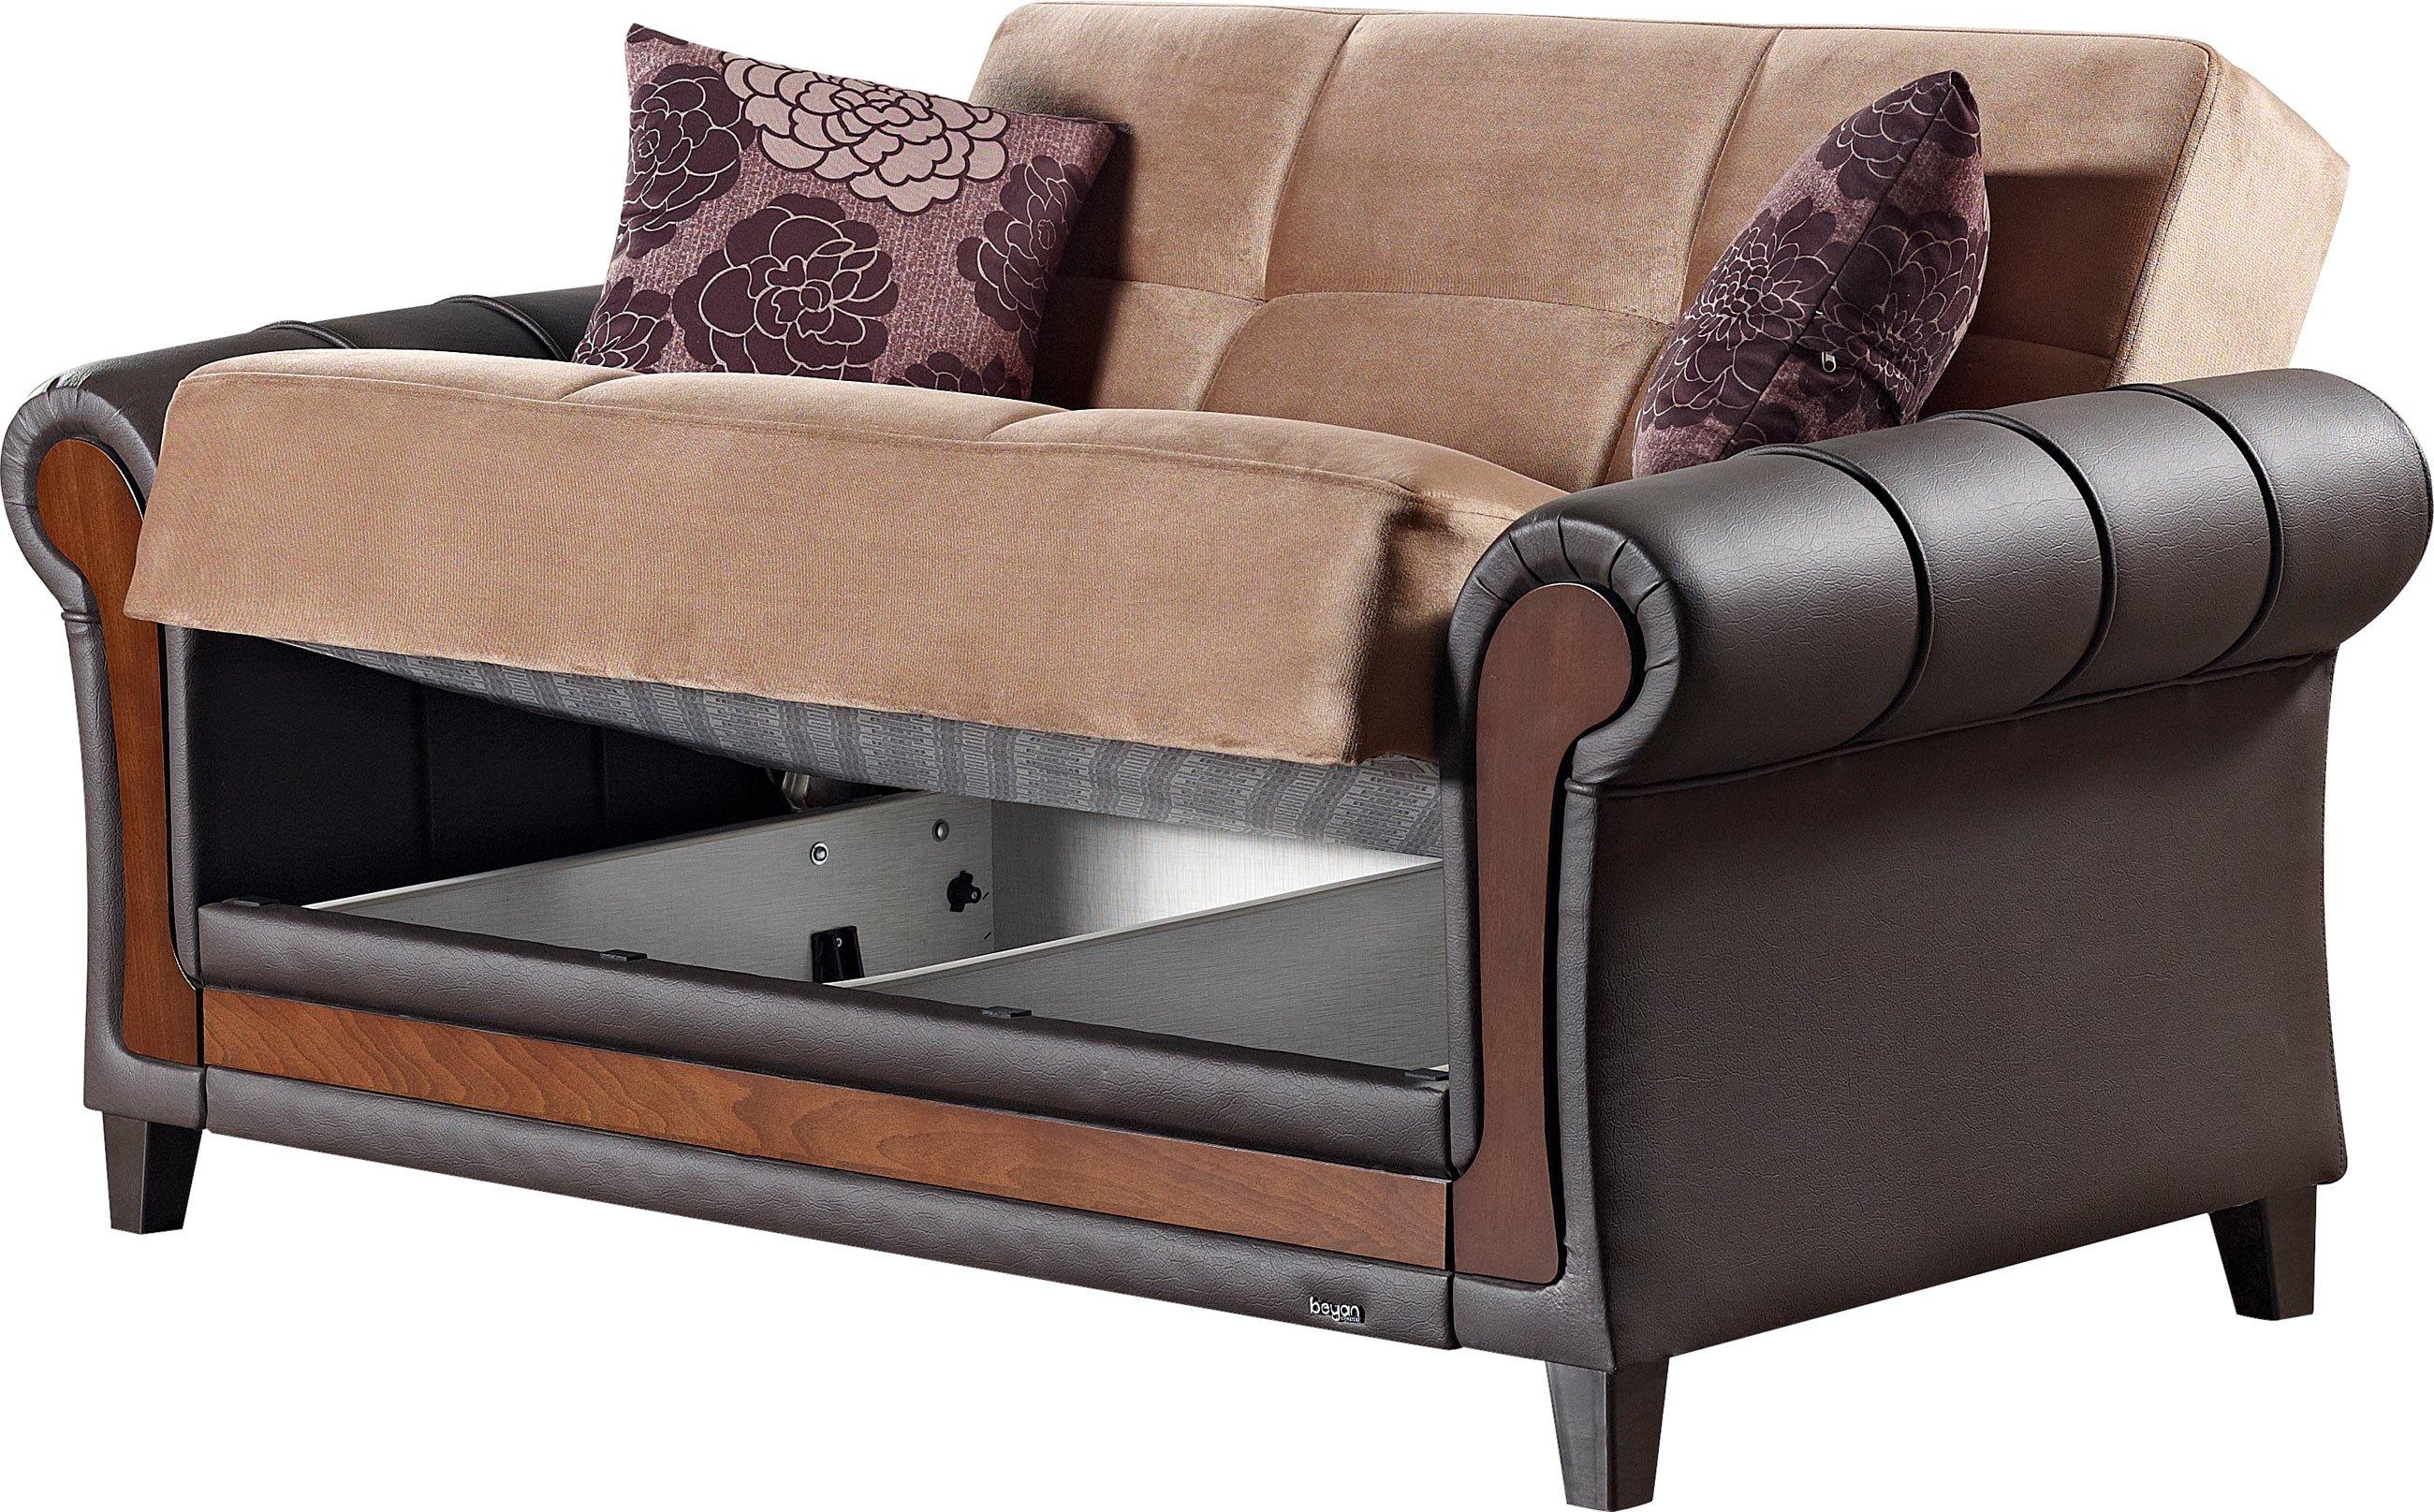 Amazing long island sectional sofa grey fabric sectional for Long island sectional sofa grey fabric